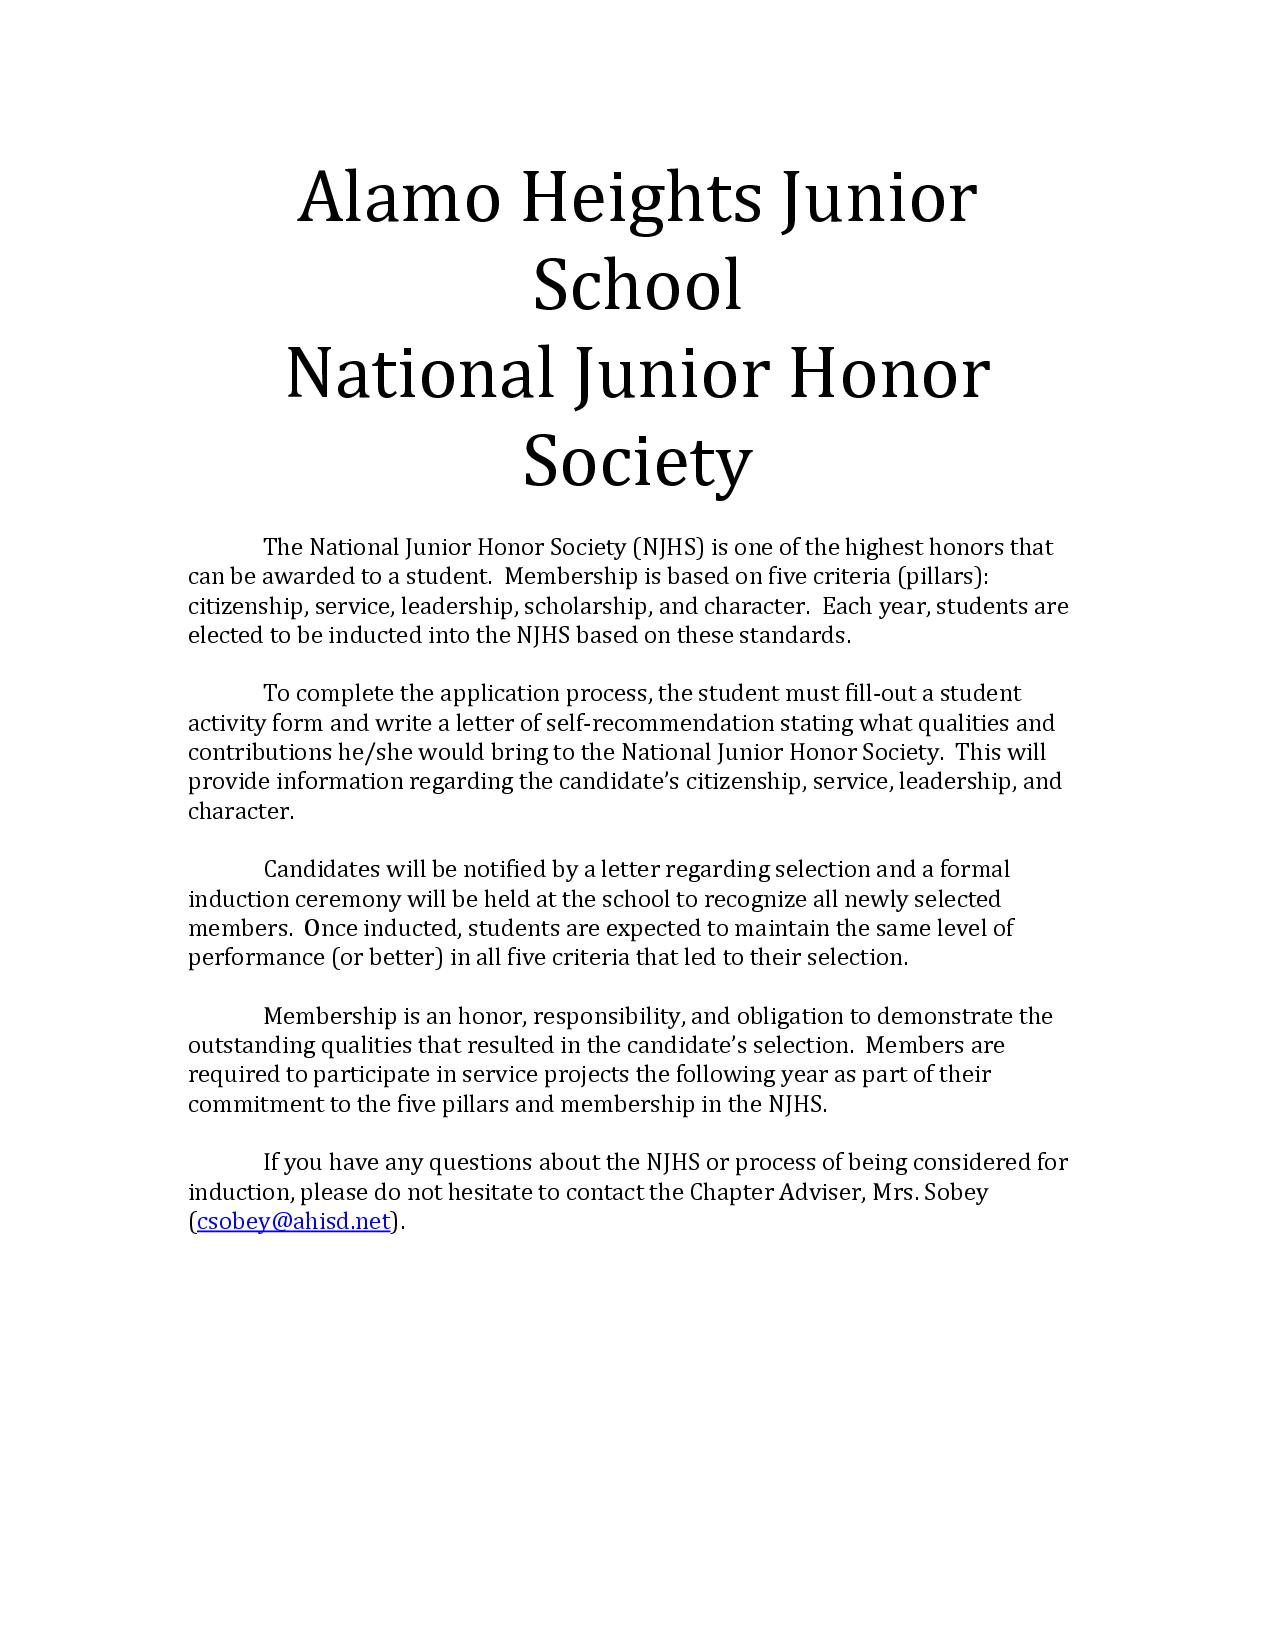 005 National Honor Society Application Essay Example Sensational Junior Ideas Examples Full